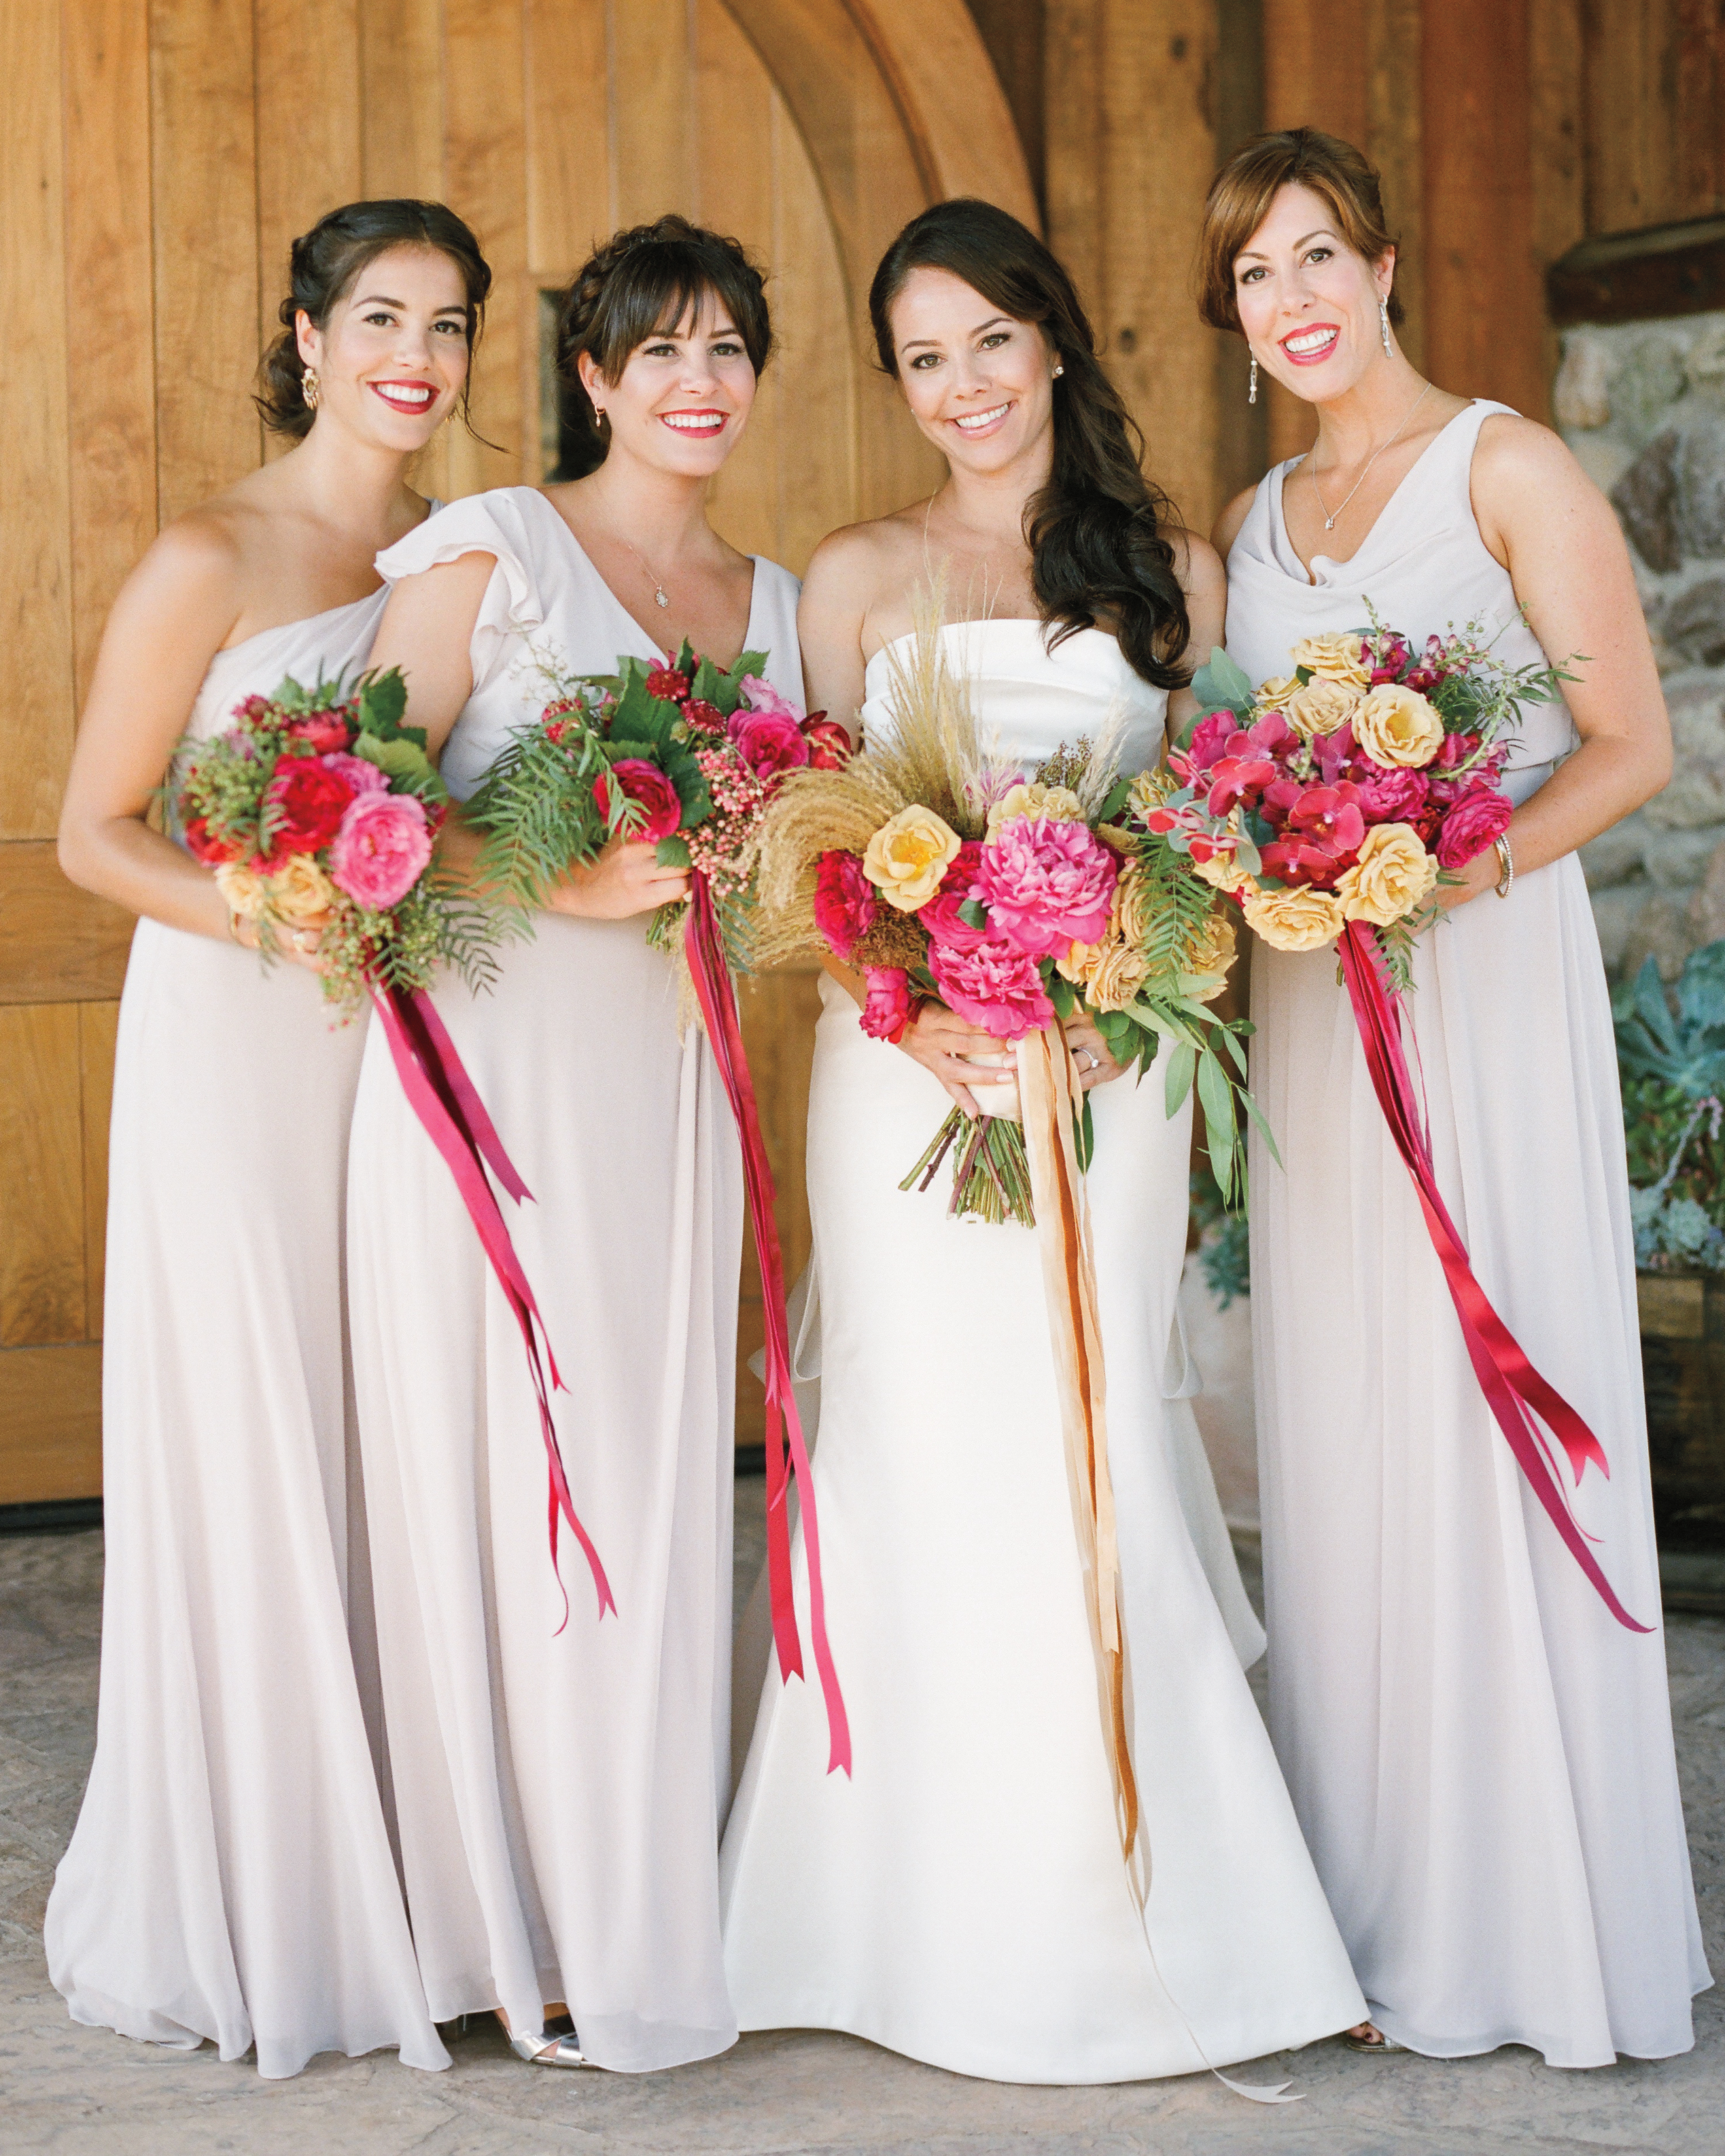 corrine-patrick-wedding-santa-ynez-44630001-s110842.jpg